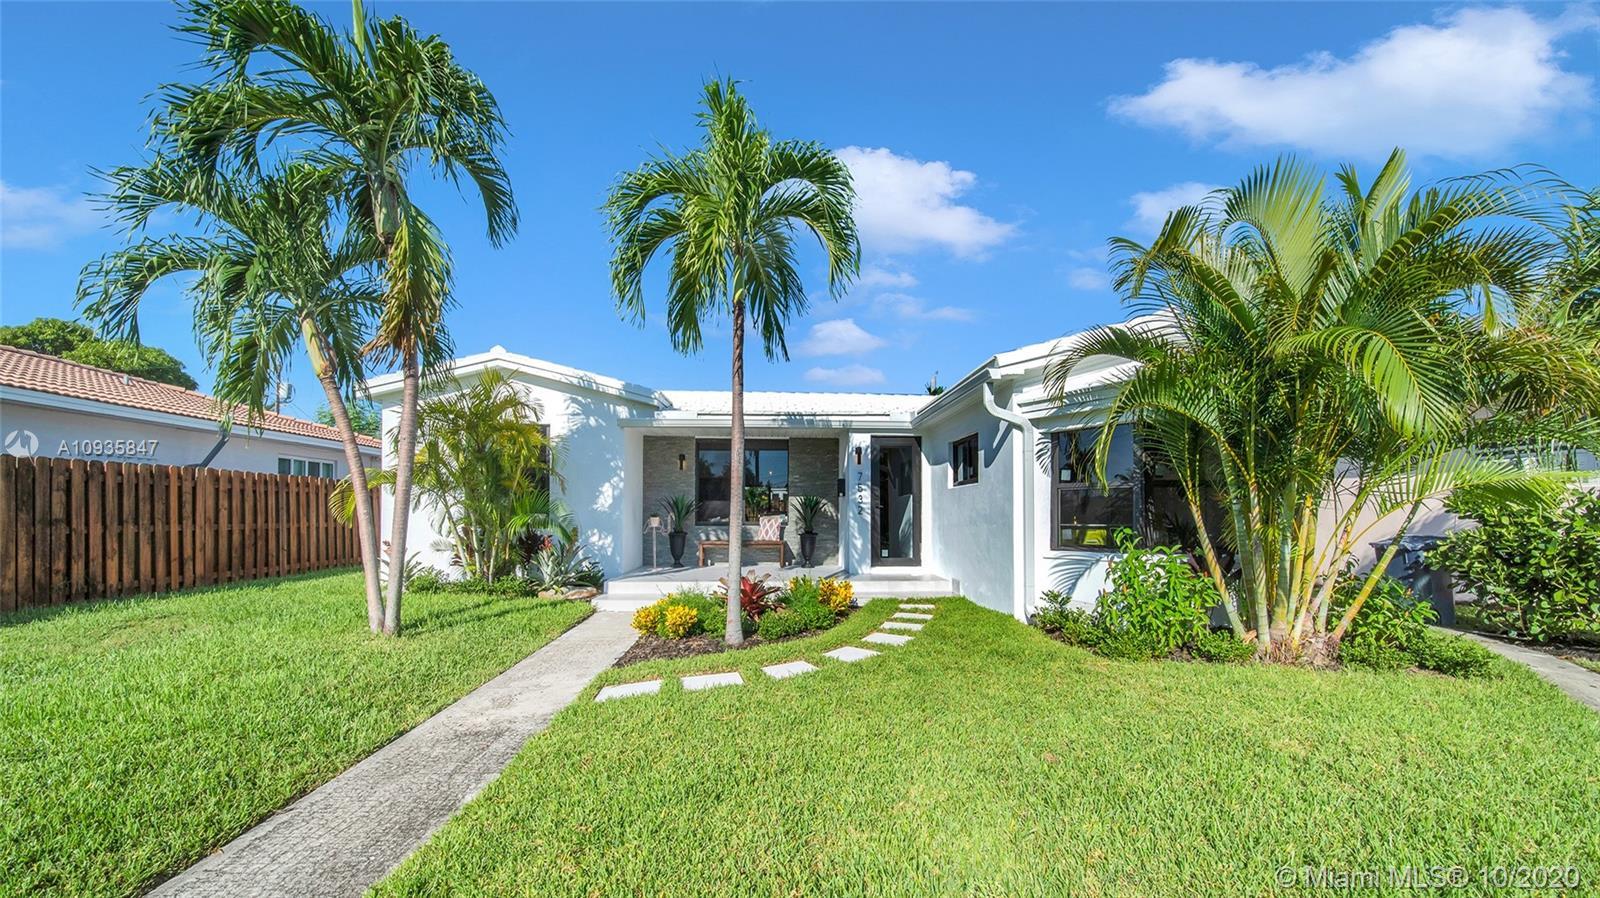 Treasure Island - 7532 Hispanola Ave, North Bay Village, FL 33141